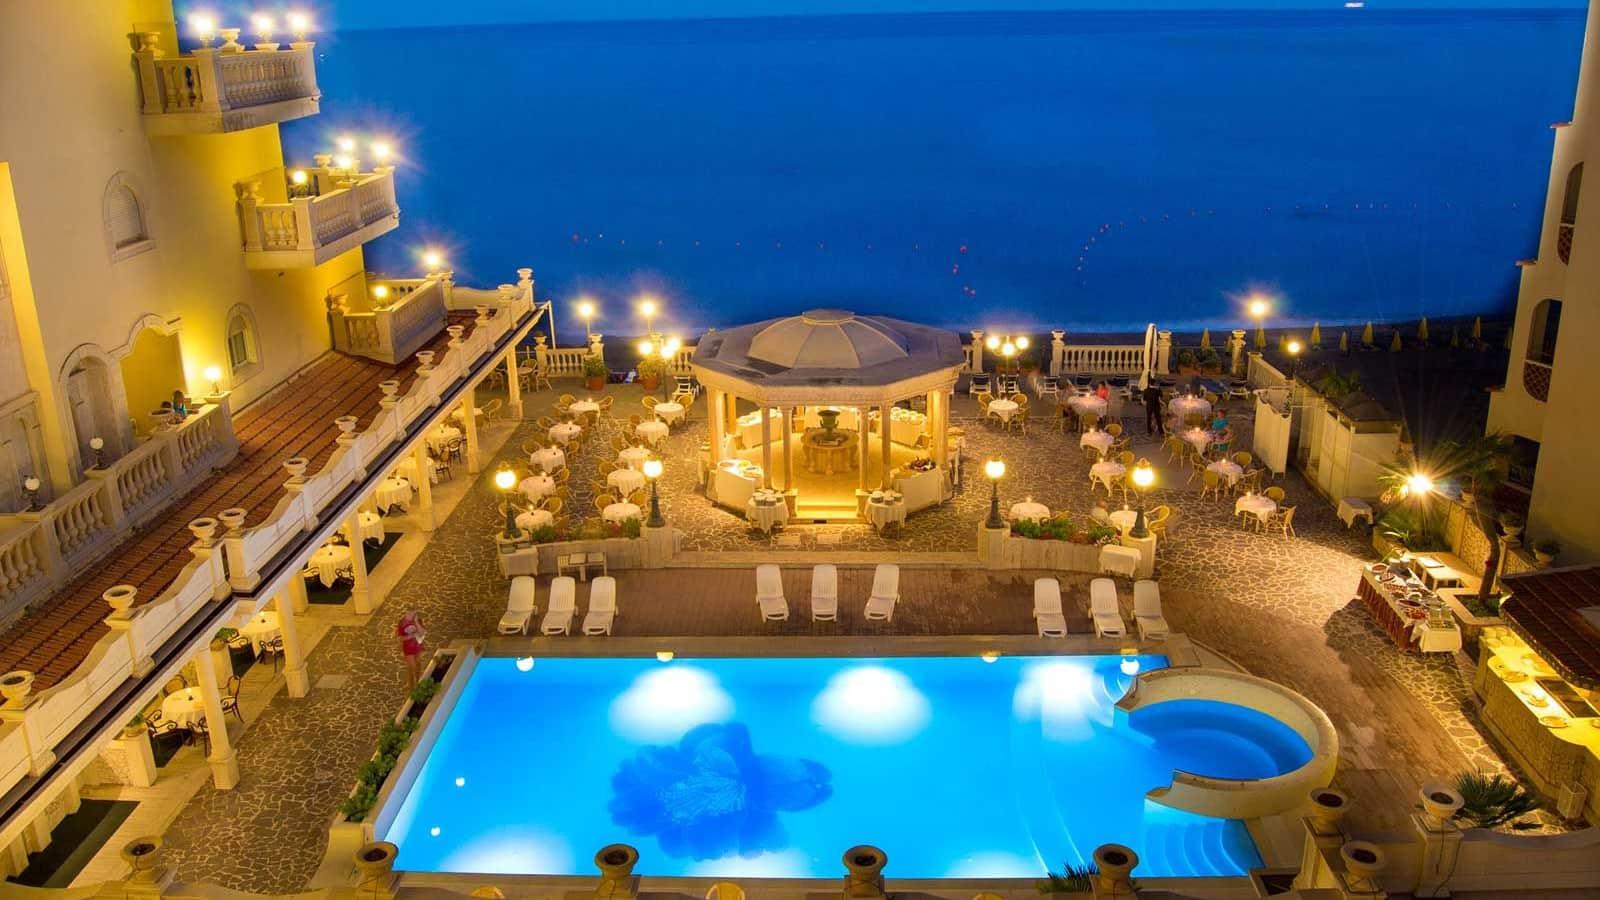 Hotel hellenia yachting giardini naxos sicily topflight - Hotel ai giardini naxos ...